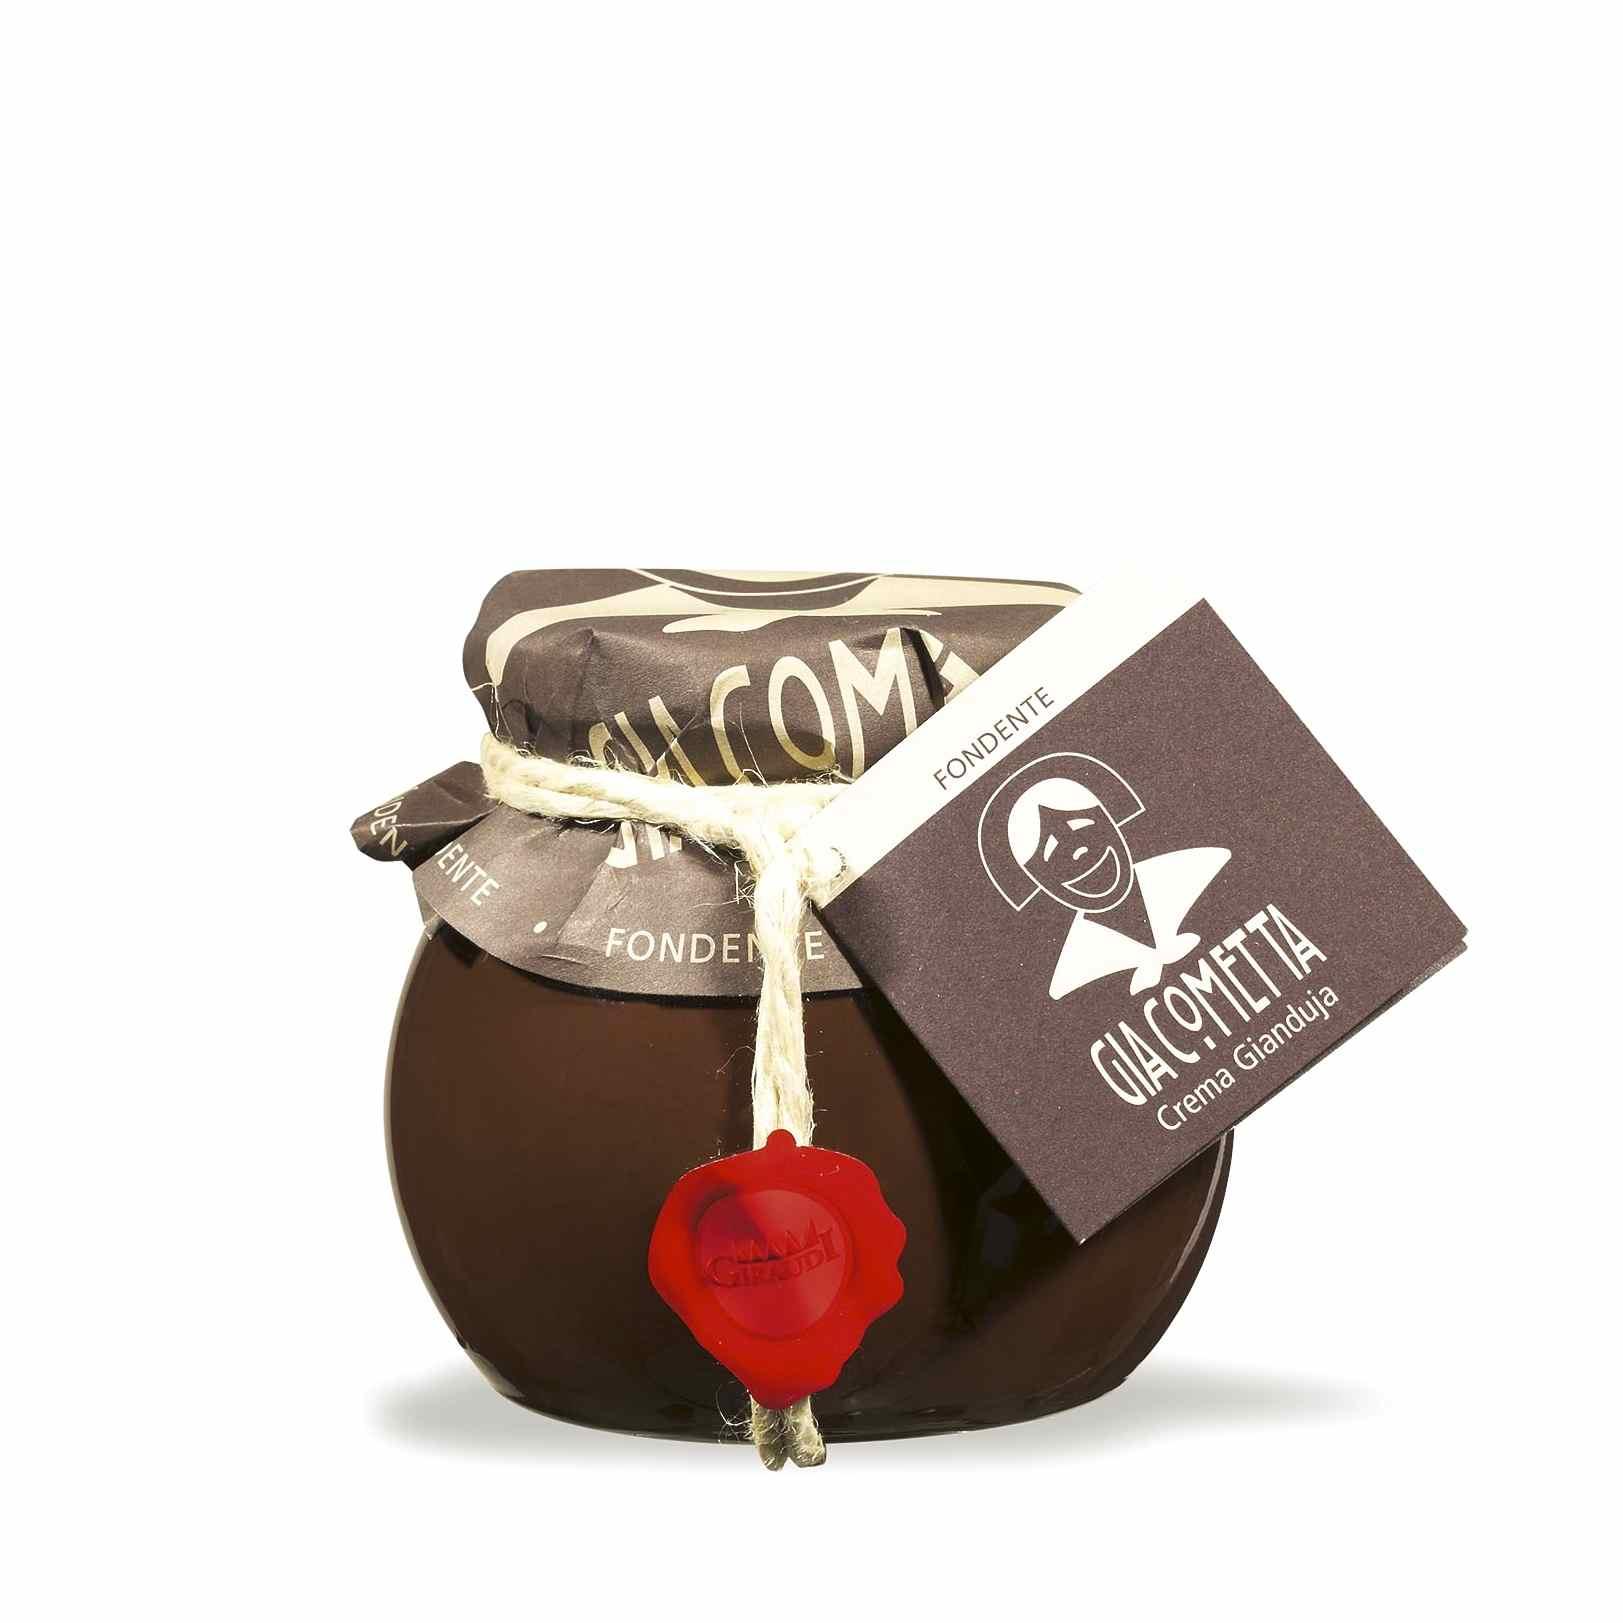 Giraudi Giacometta fondente 300 g – Giraudi dark Giacometta 300 g – Gustorotondo – Italian food boutique